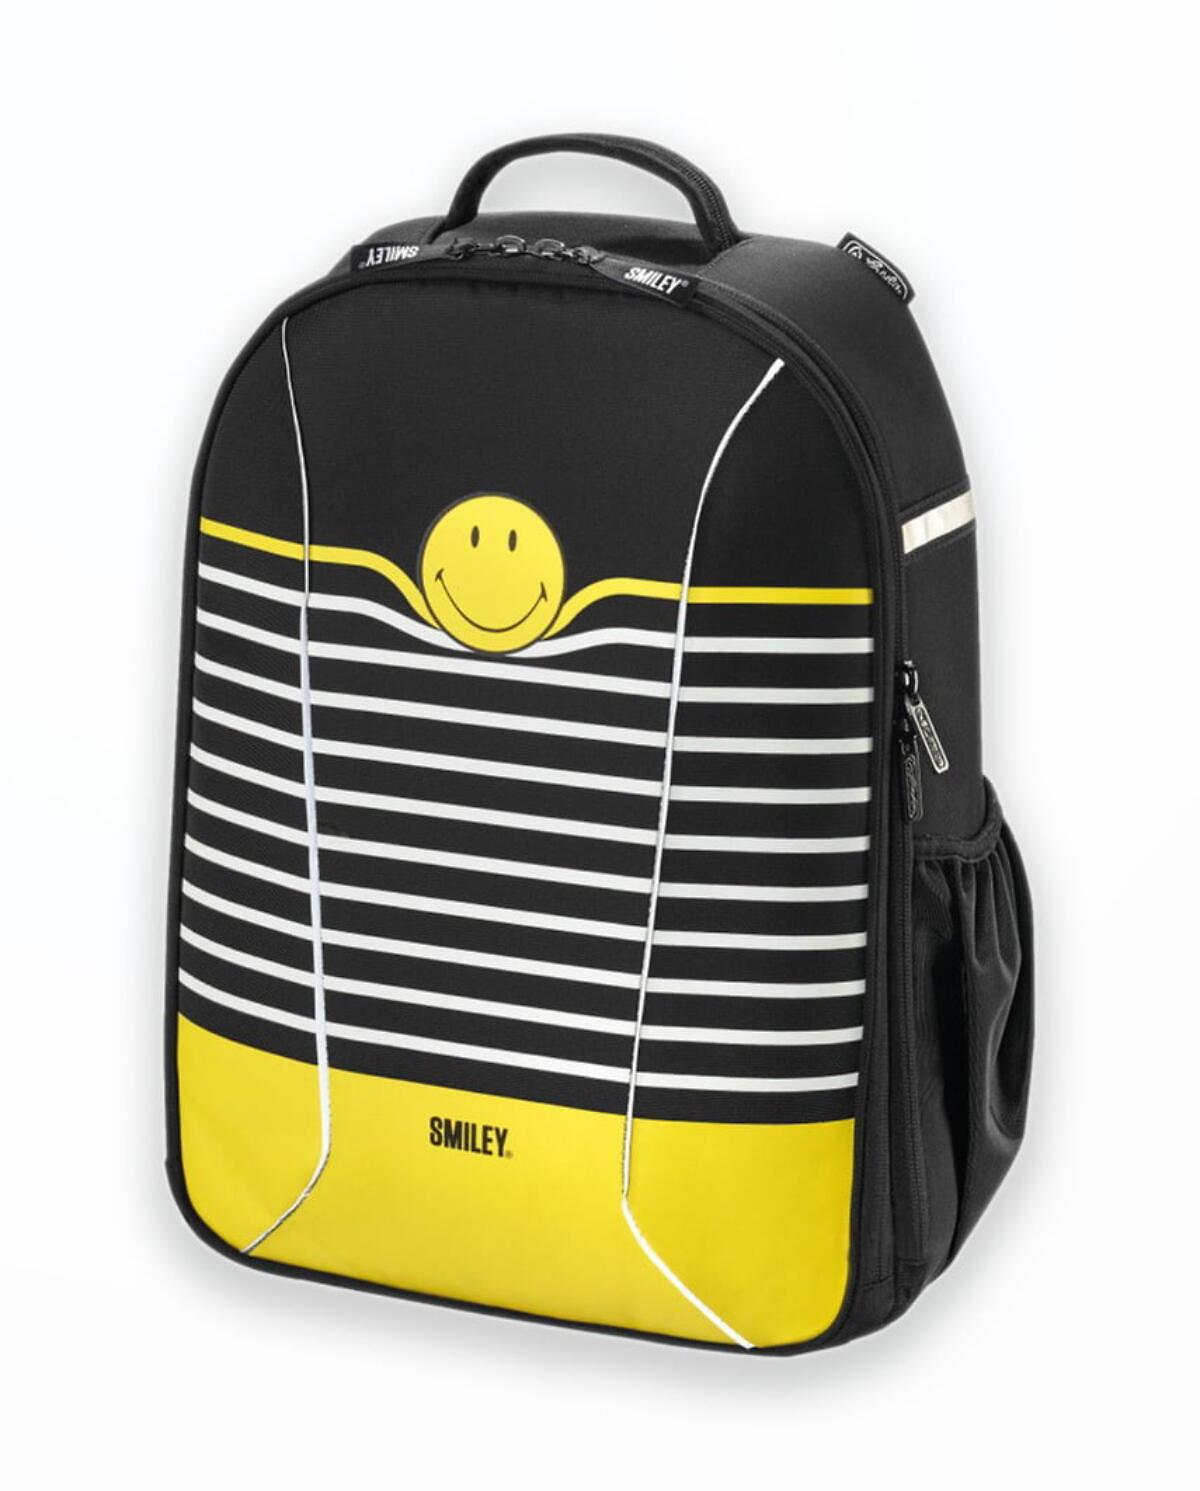 Rucsac Herlitz  Be.Bag Ergonomic Airgo Smiley World Black Stripes